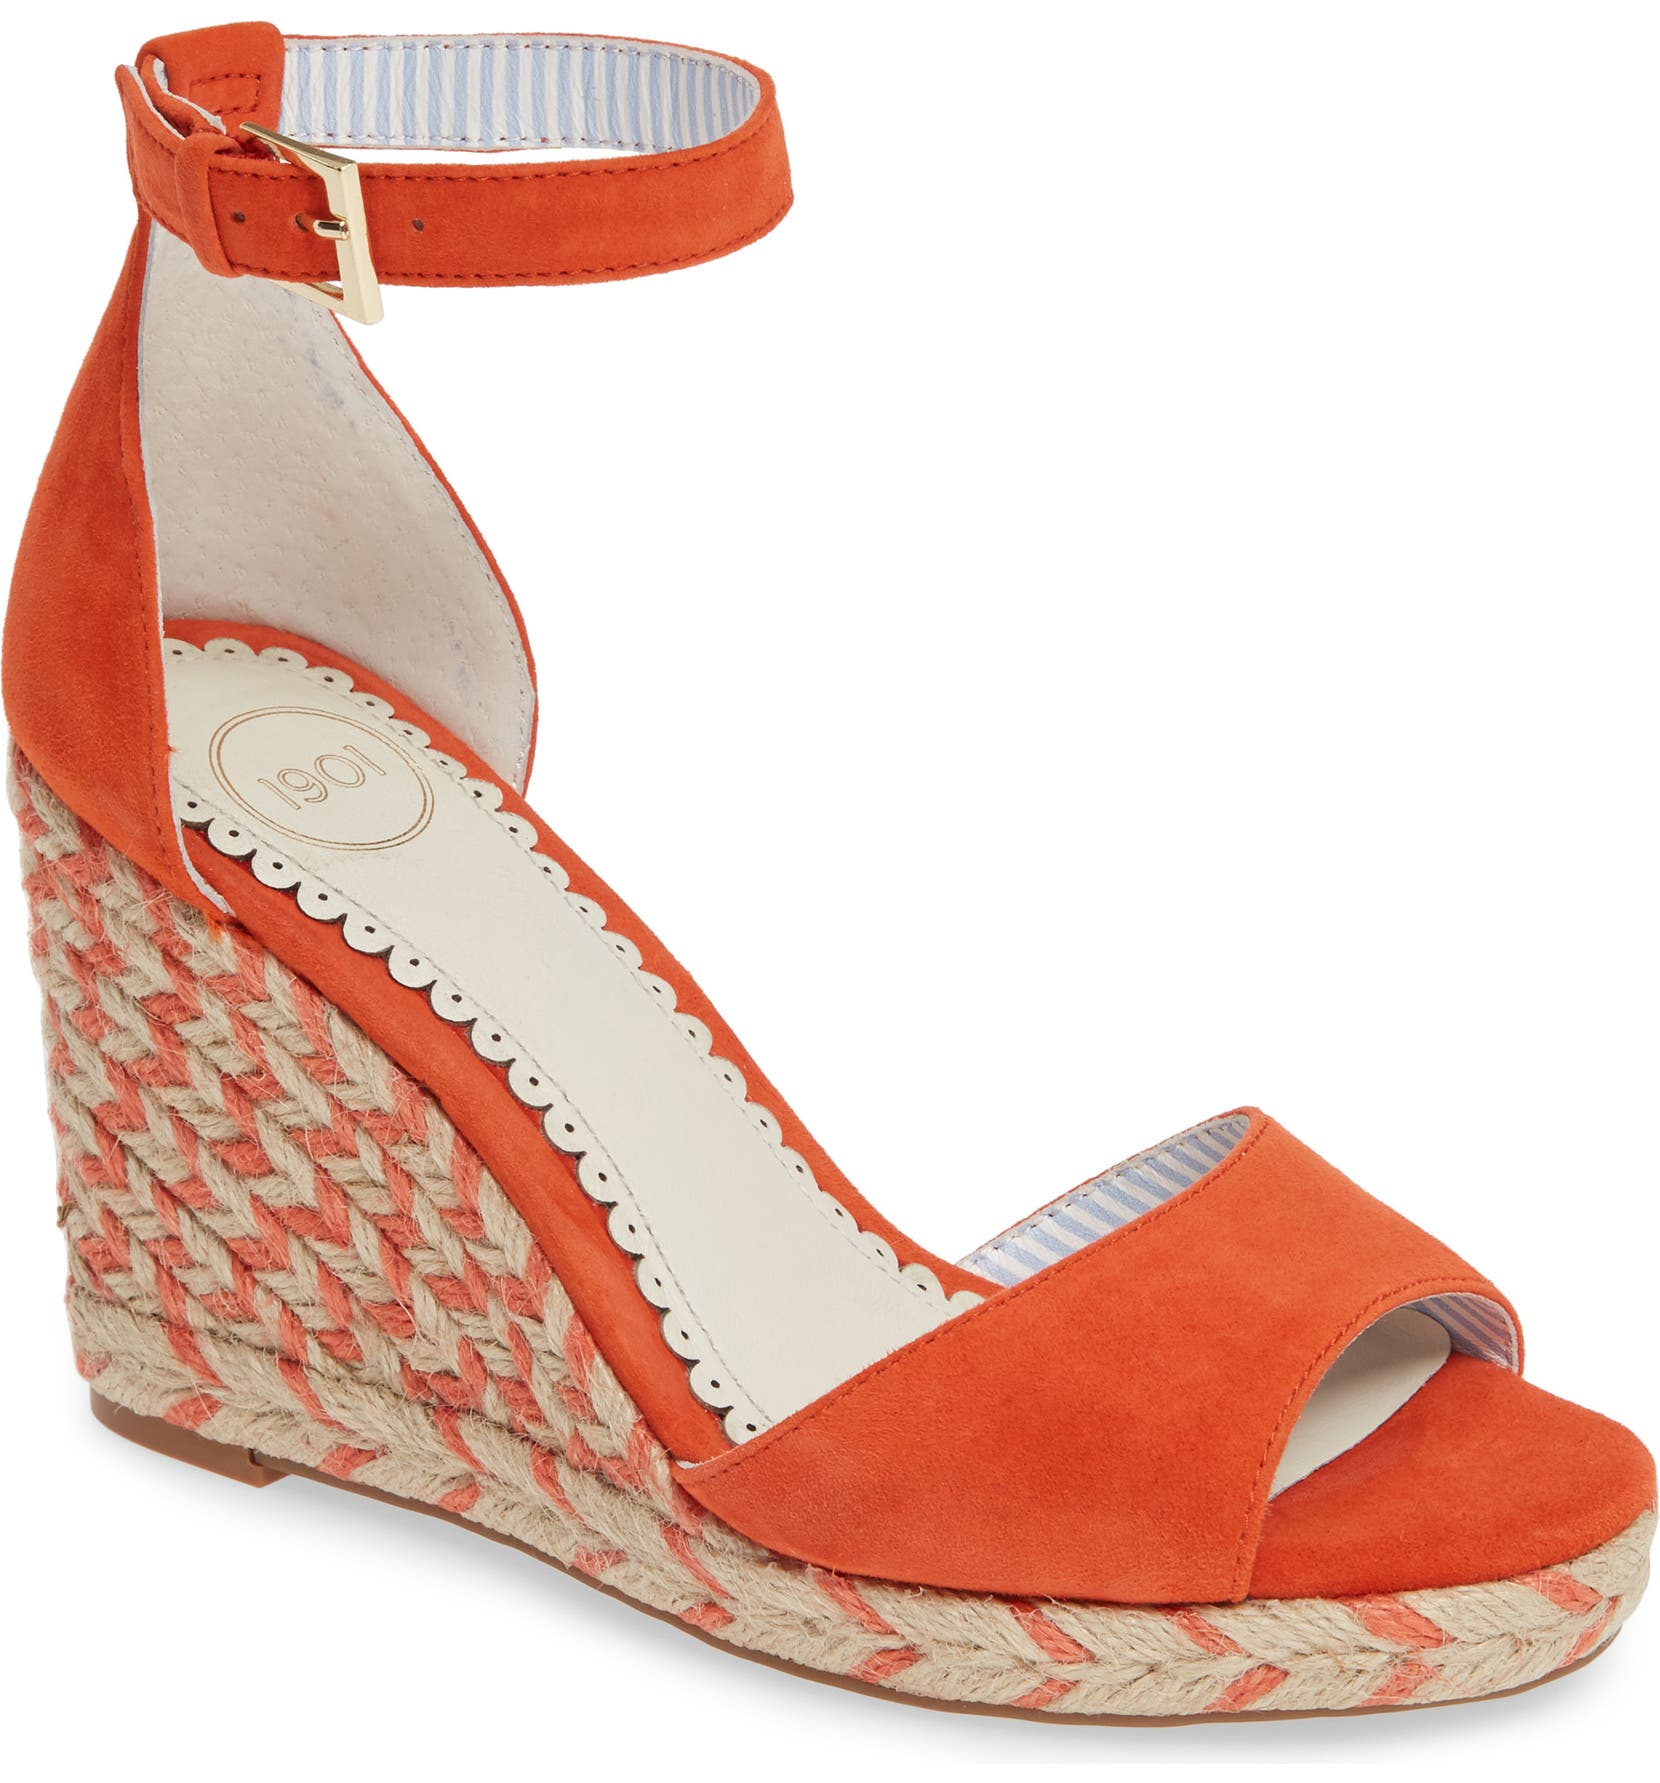 7c566858dee Nadine Espadrille Wedge Ankle Strap Sandal